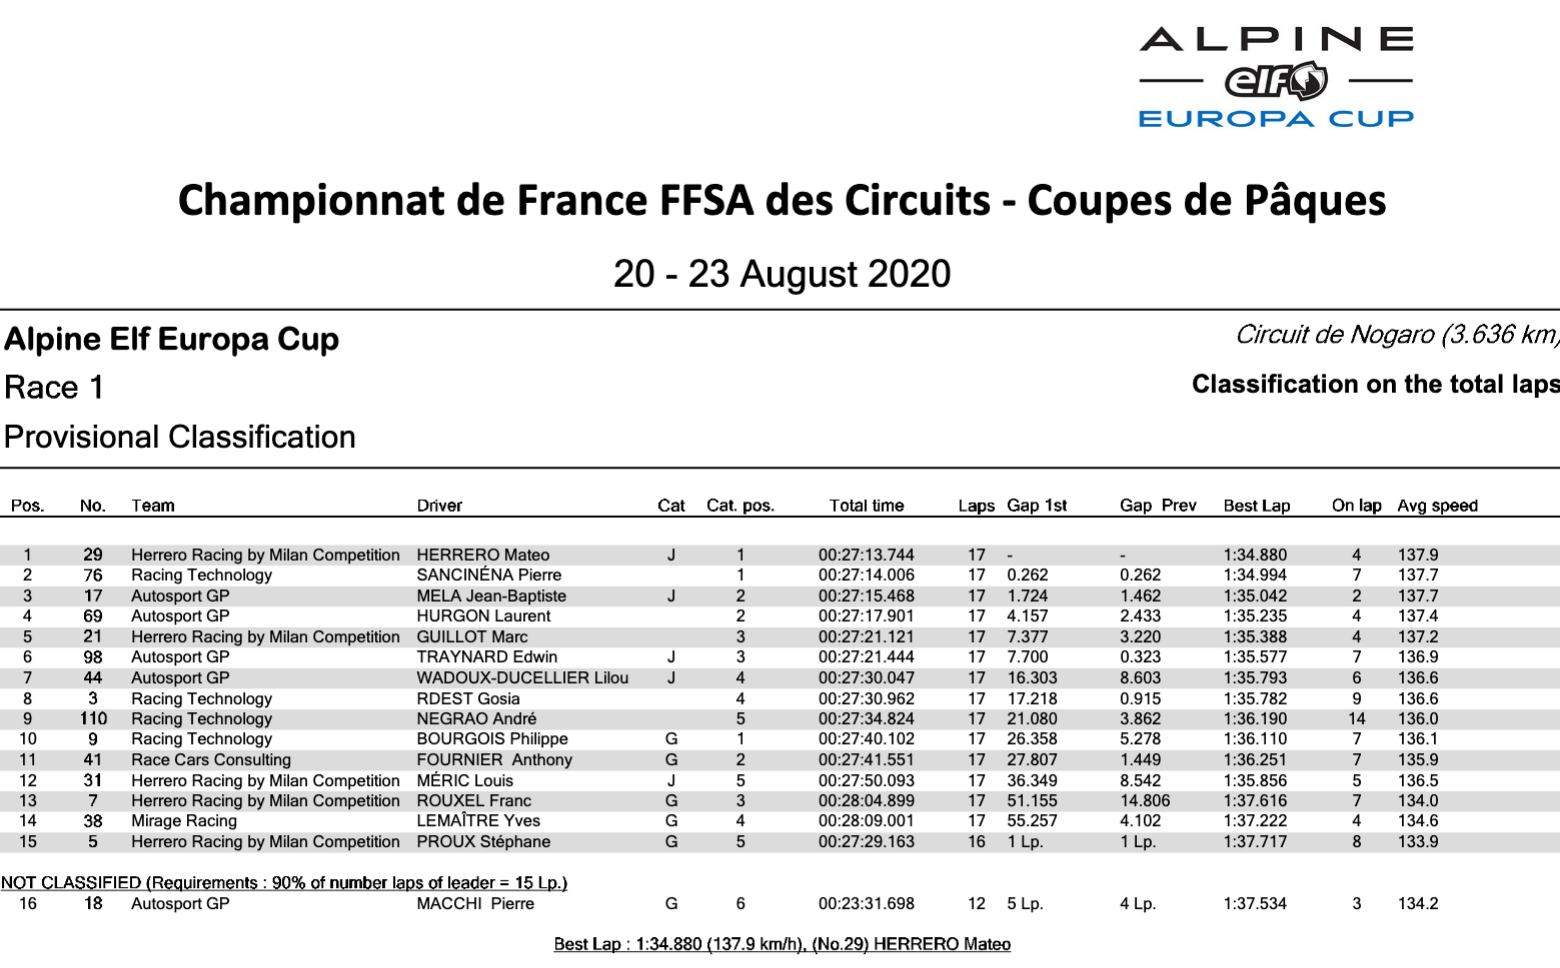 Alpine Elf Europa Cup Classement course 1 Nogaro 2020 | Alpine Elf Europa Cup 2020: Herrero et Traynard au sommet à Nogaro